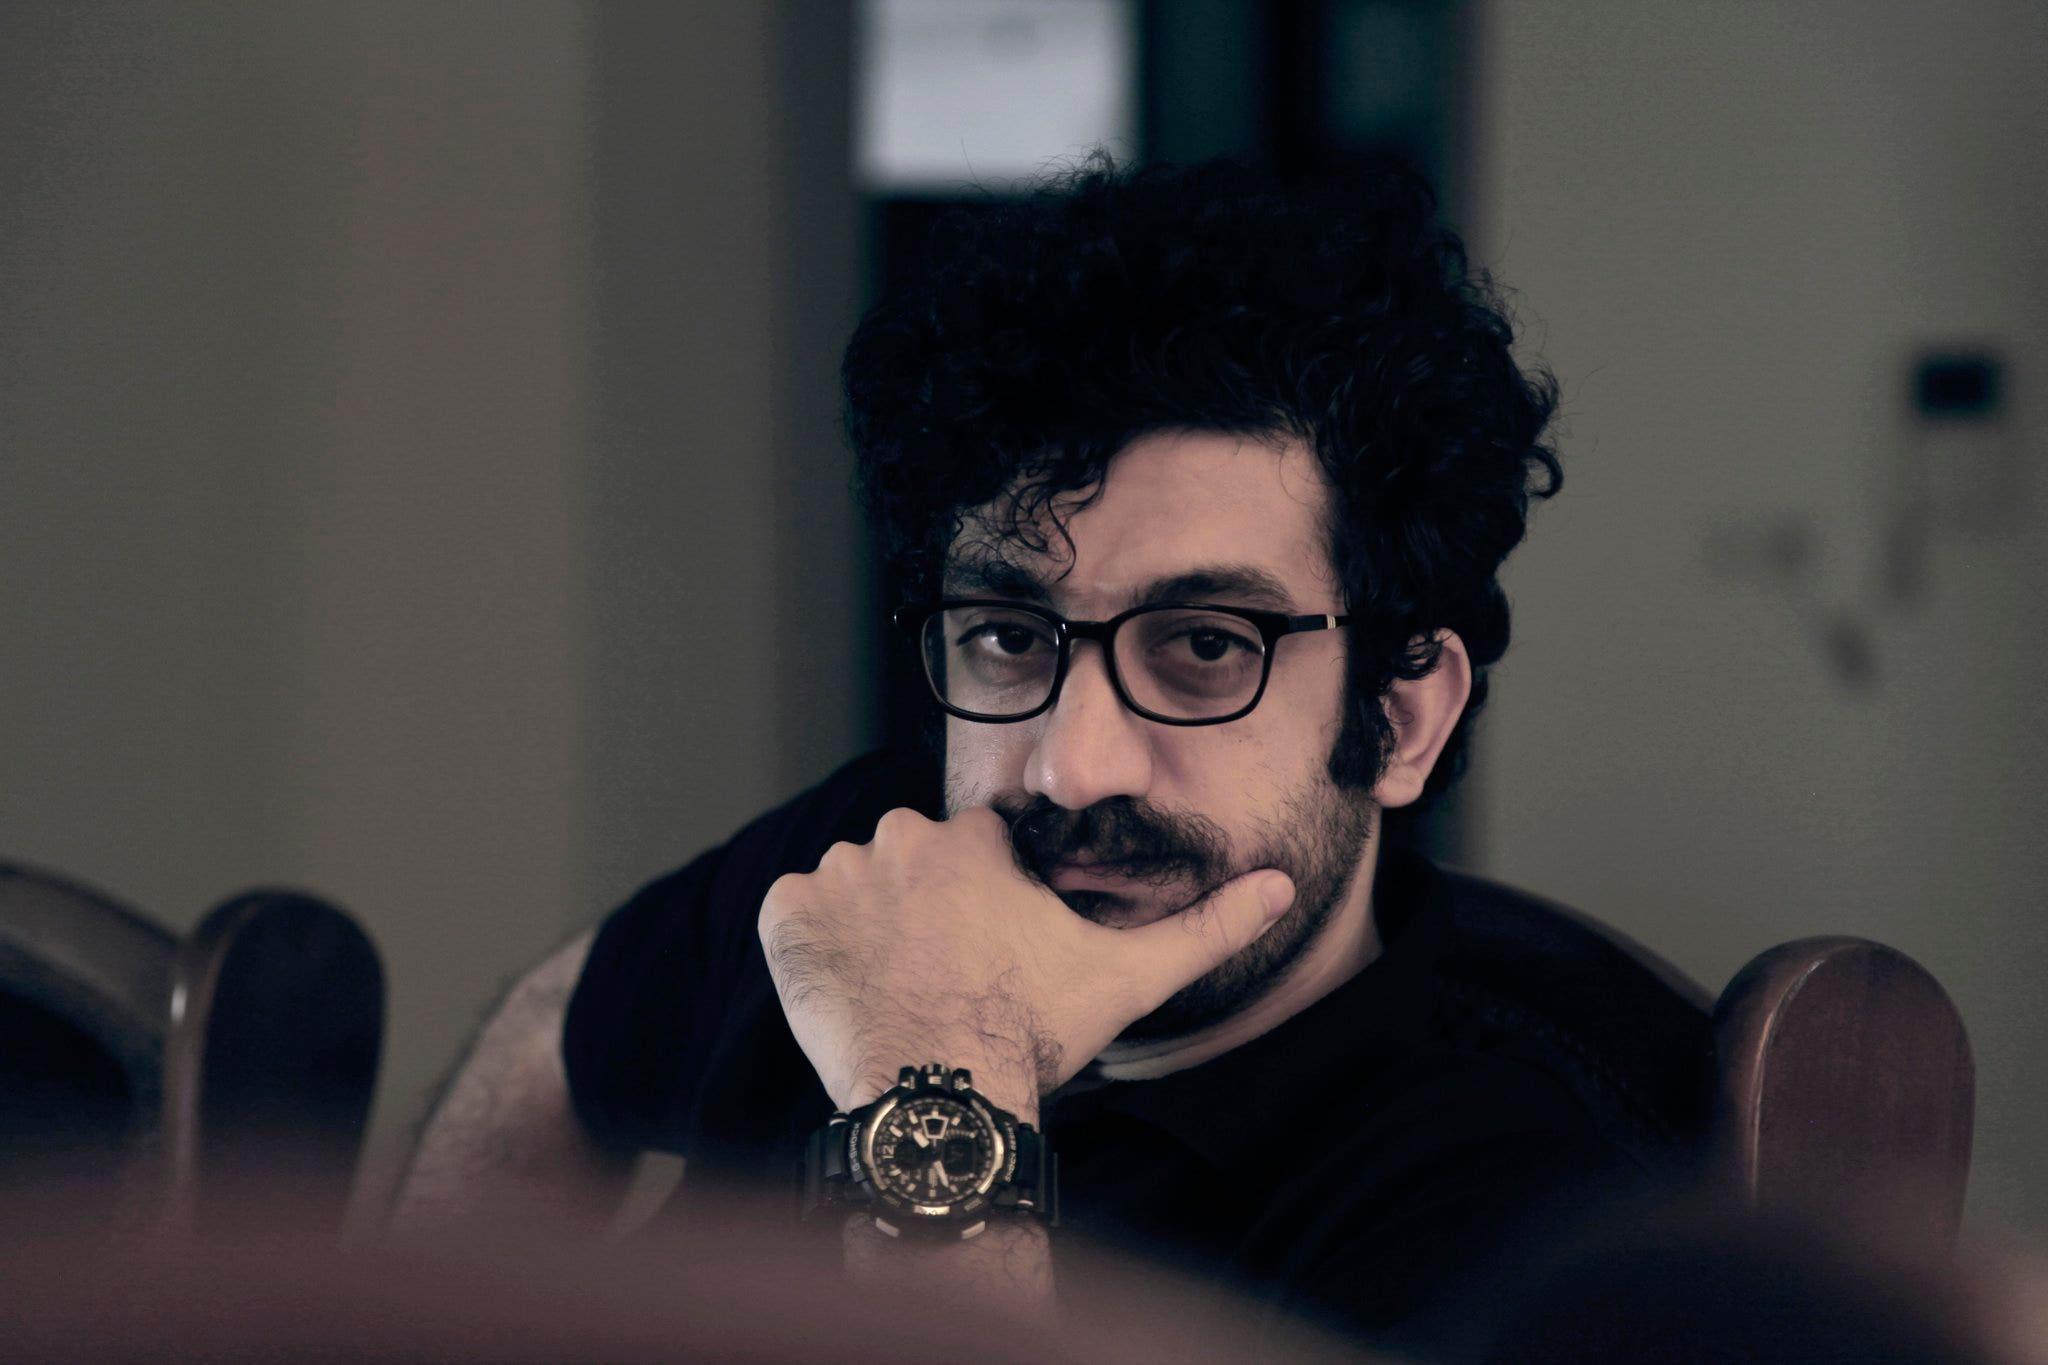 Iranian artist defies regime by releasing new album, risking imprisonment